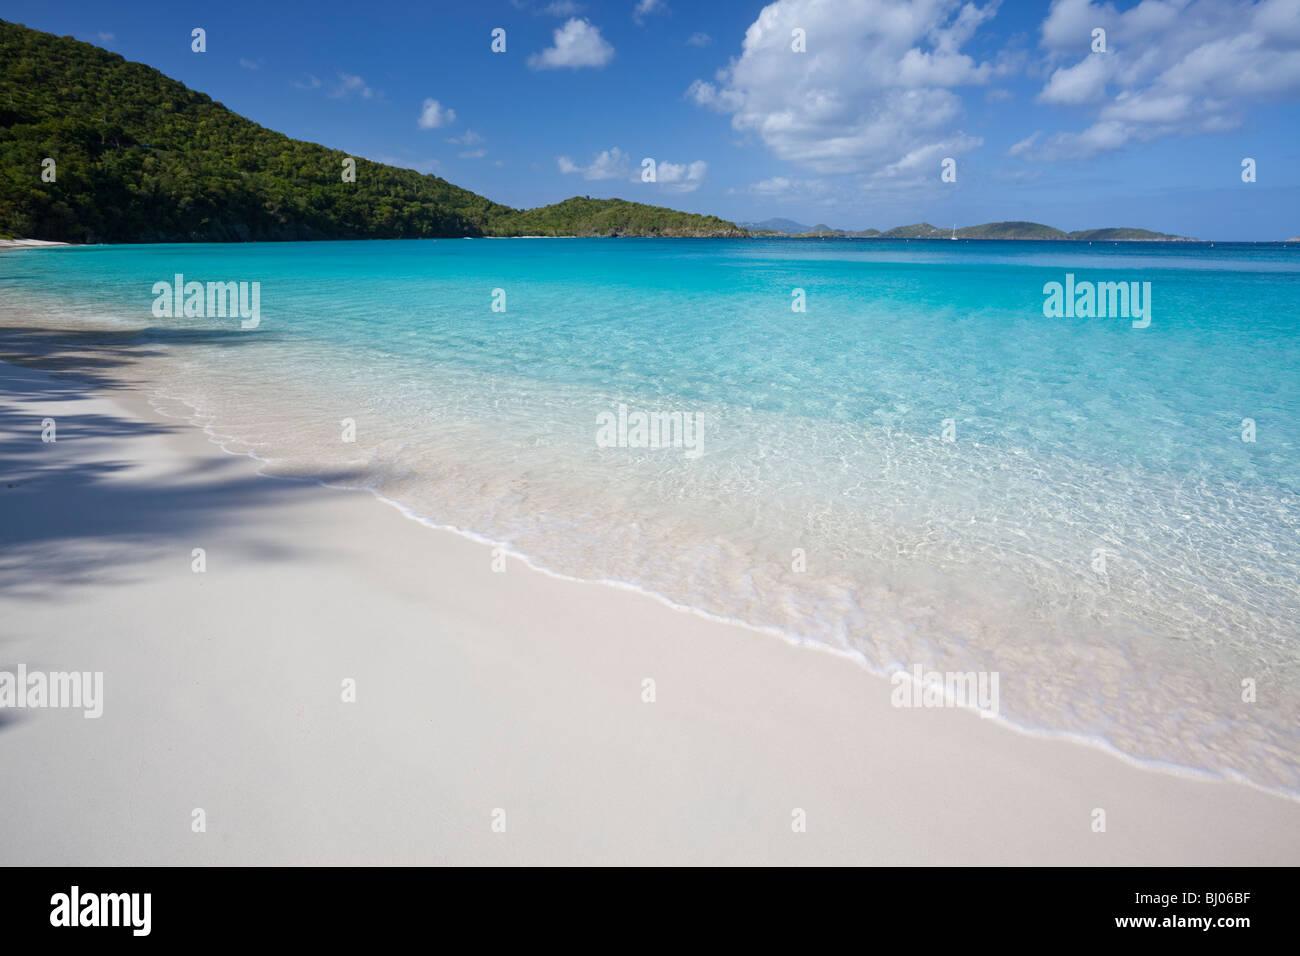 Tropical beach in US Virgin Islands - Stock Image